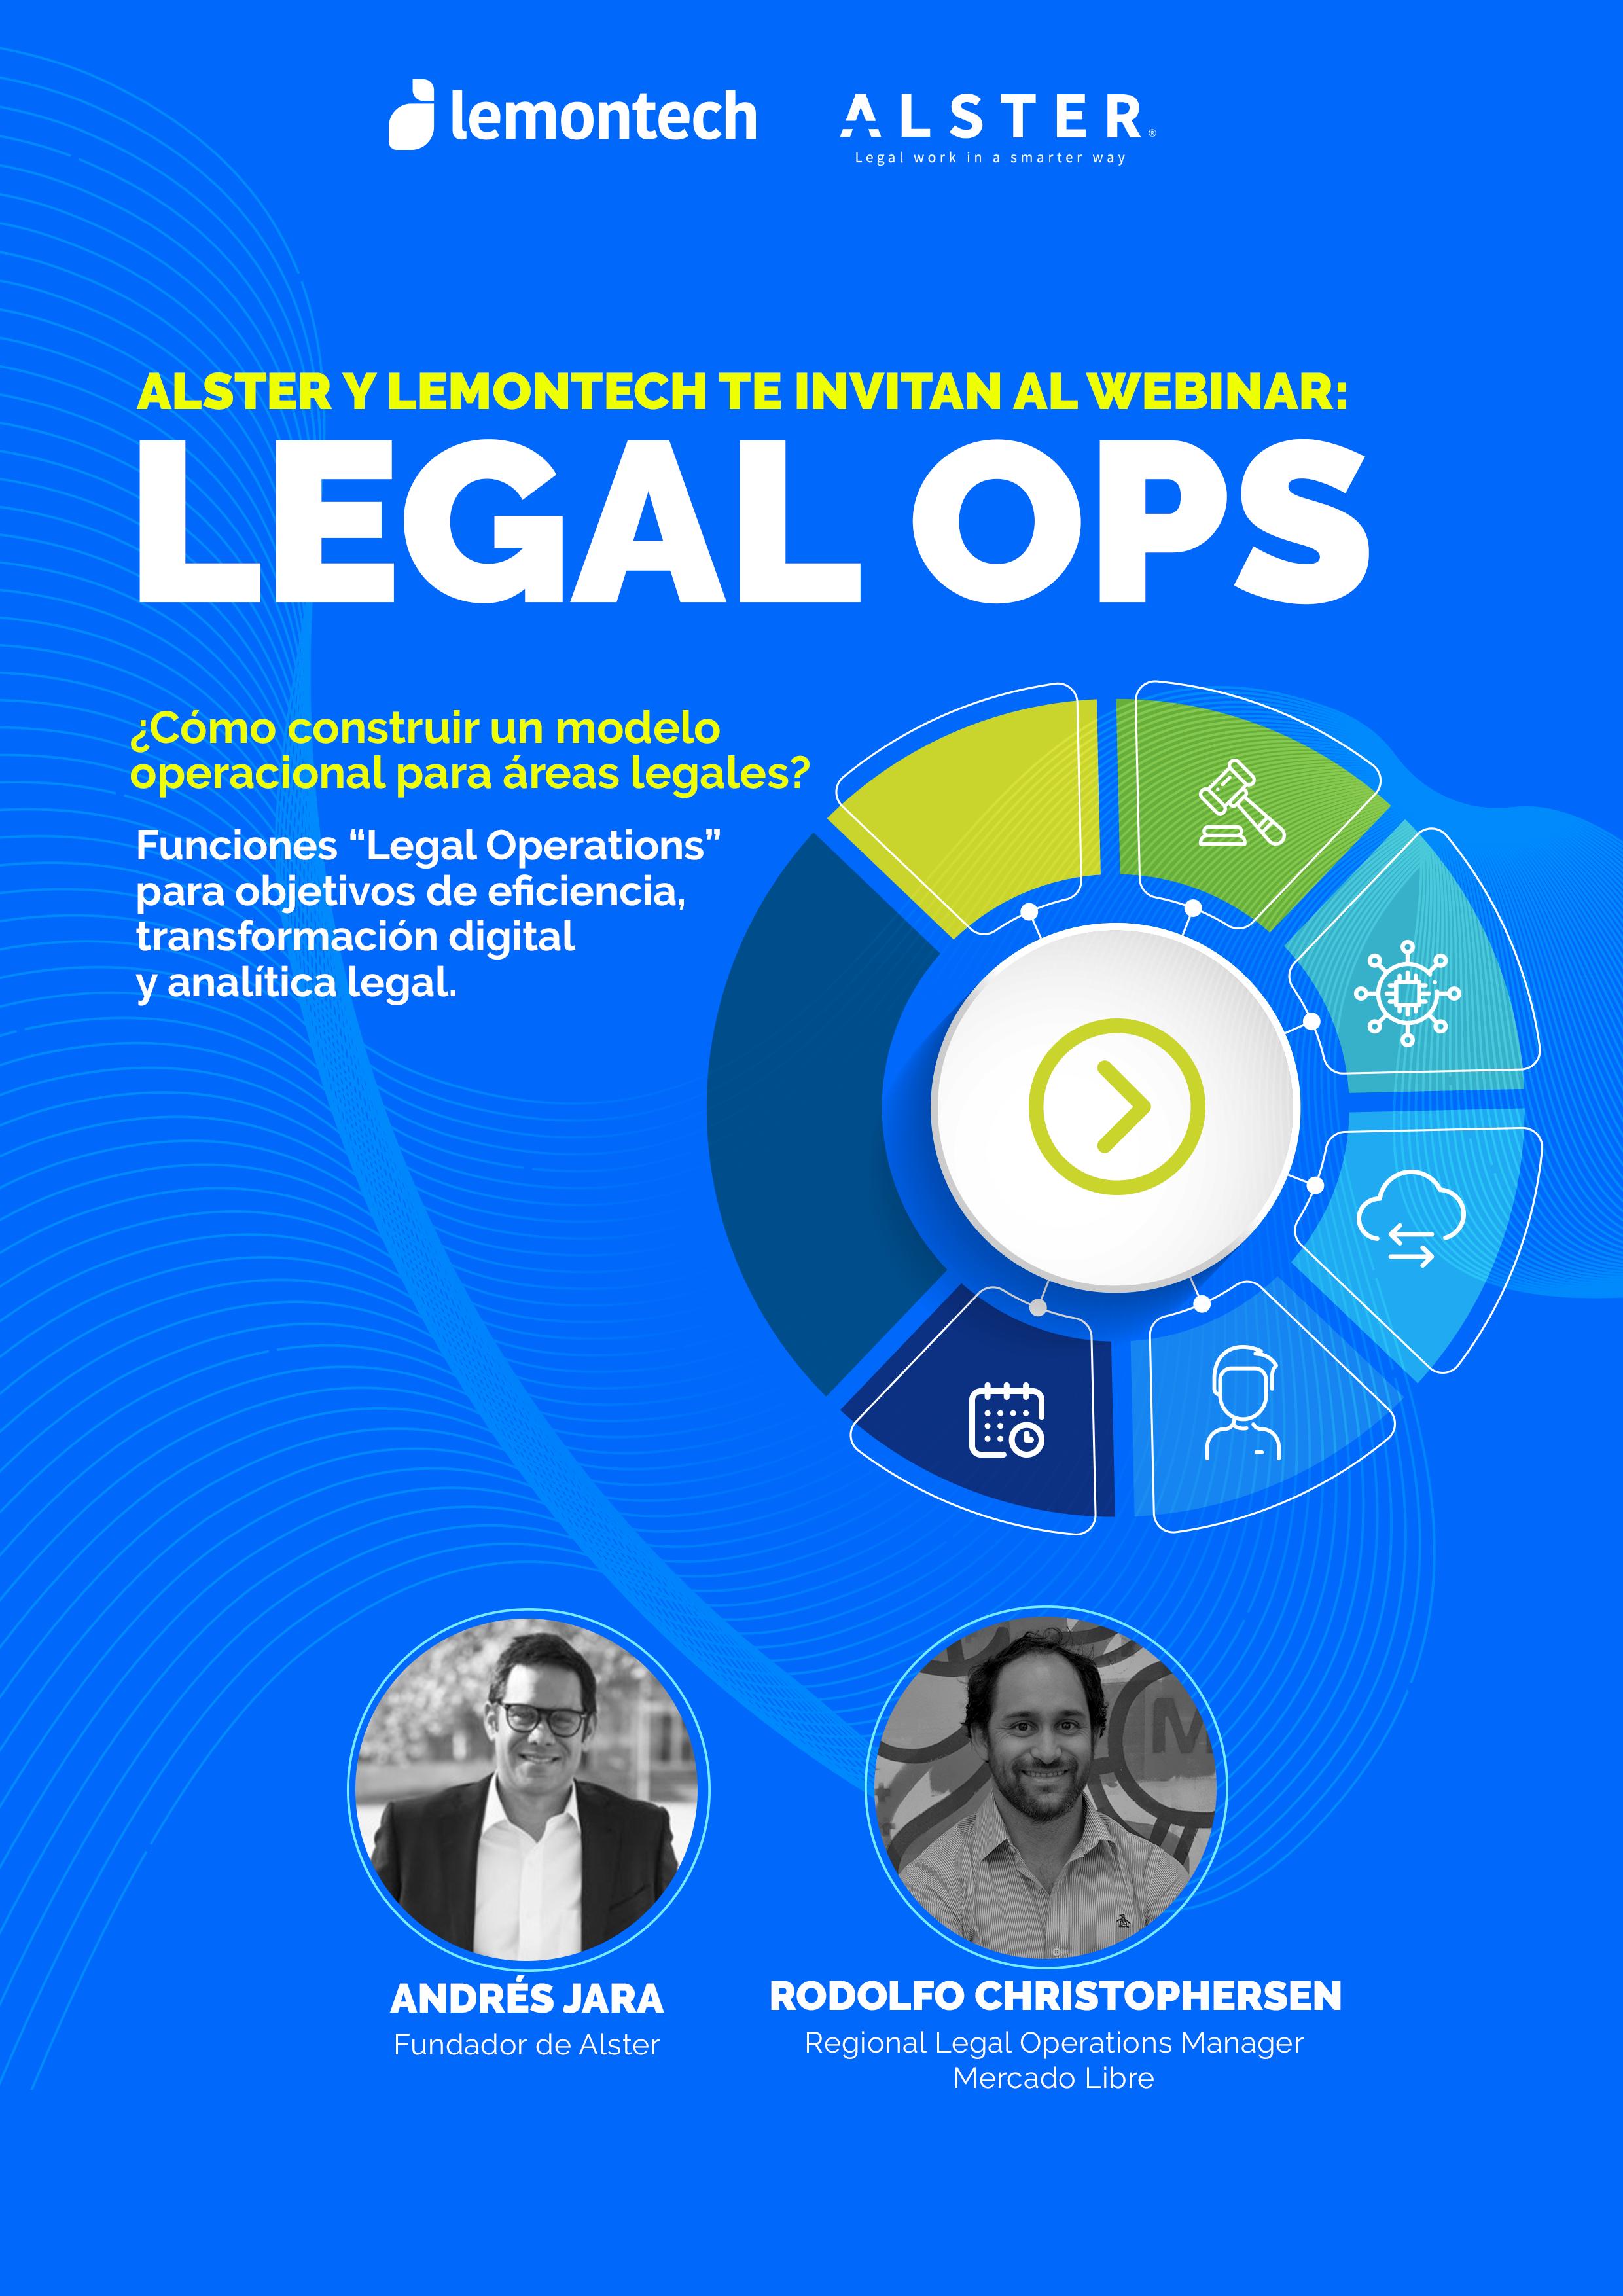 Webinar: Legal-Ops